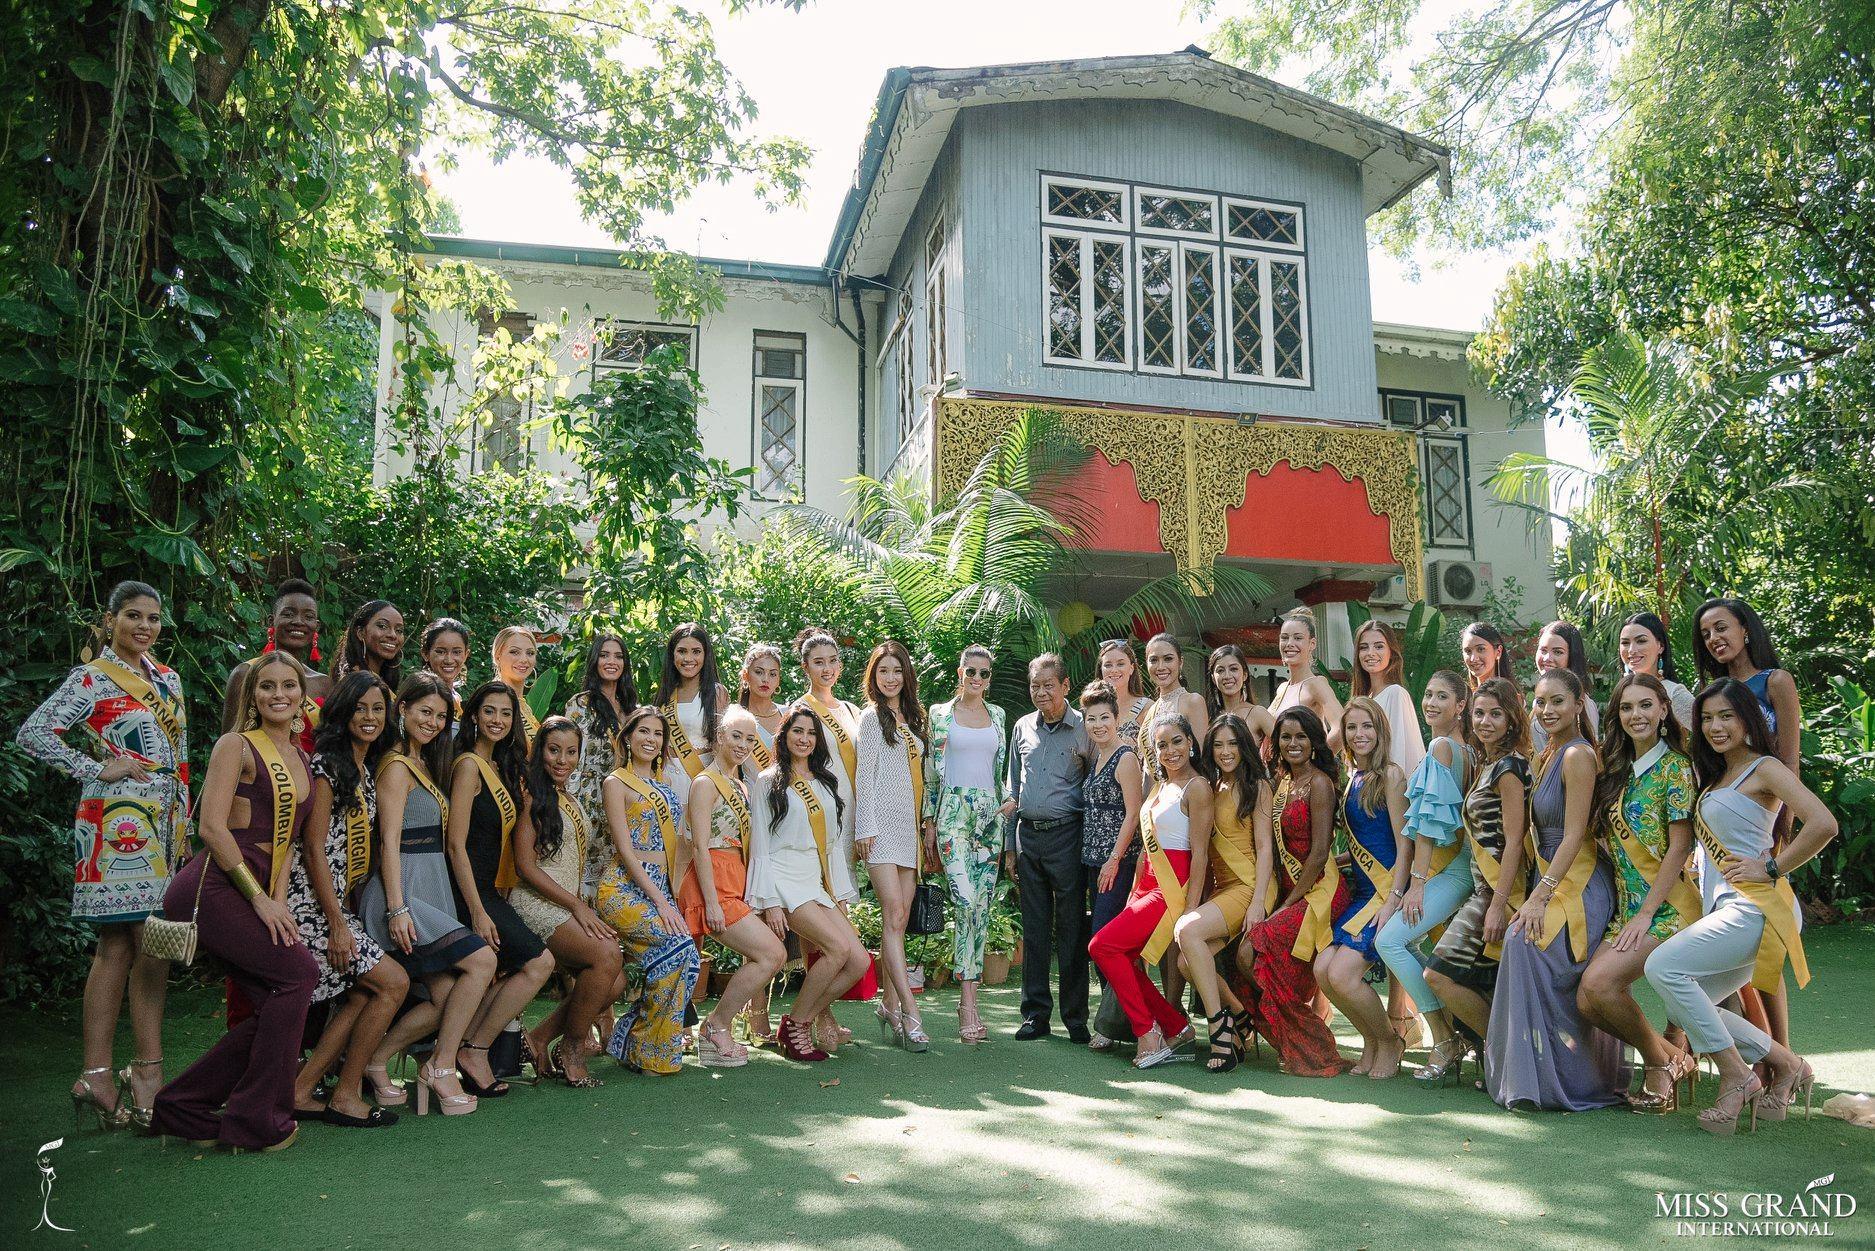 sheyla quizena, miss grand colombia 2018. - Página 6 Nkv3ep10